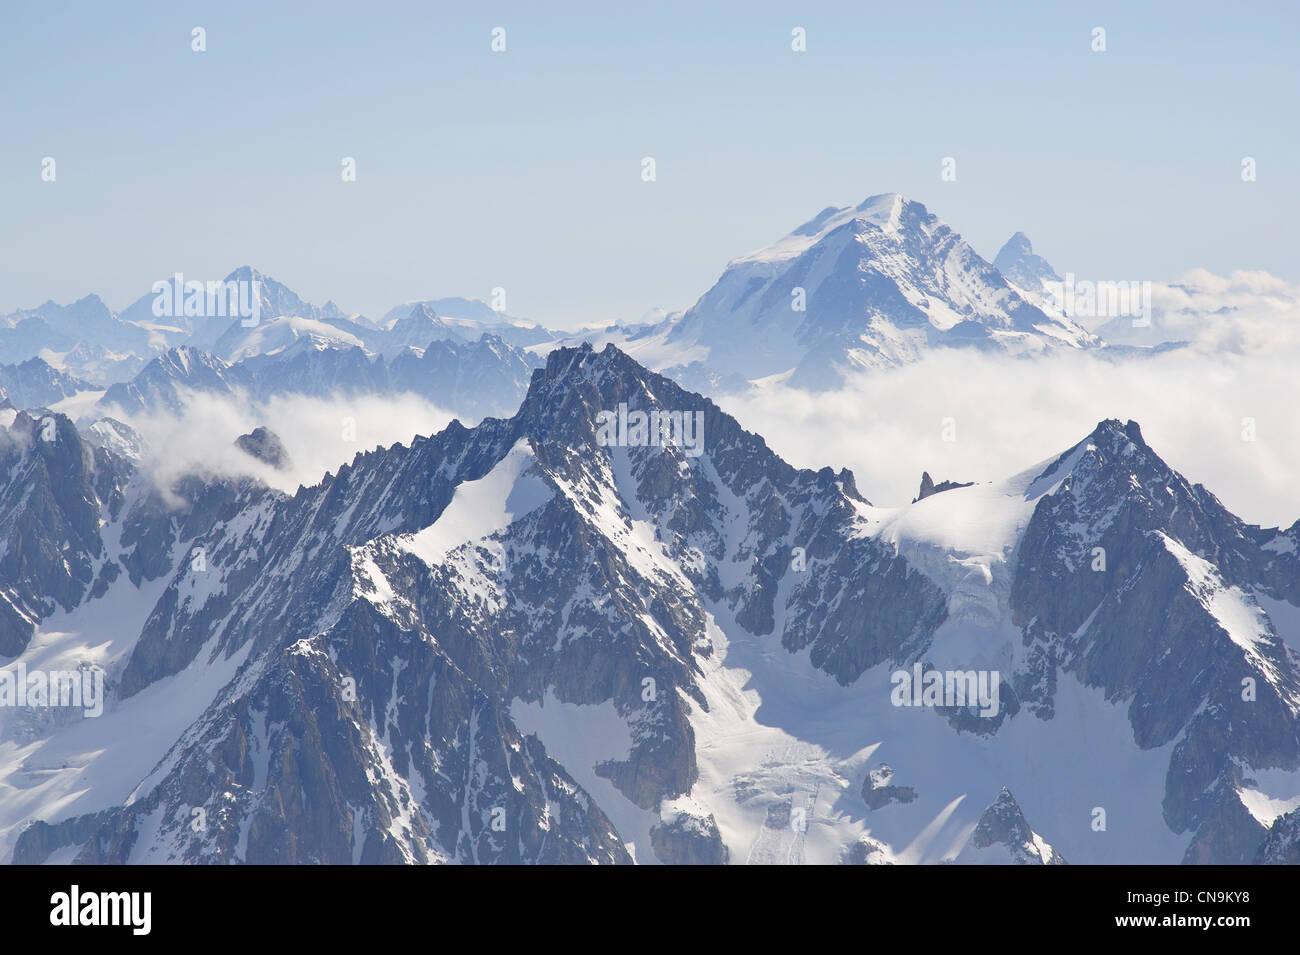 France, Haute Savoie, Chamonix, Grand Combin (4314 m) seen from Aiguille du Midi - Stock Image